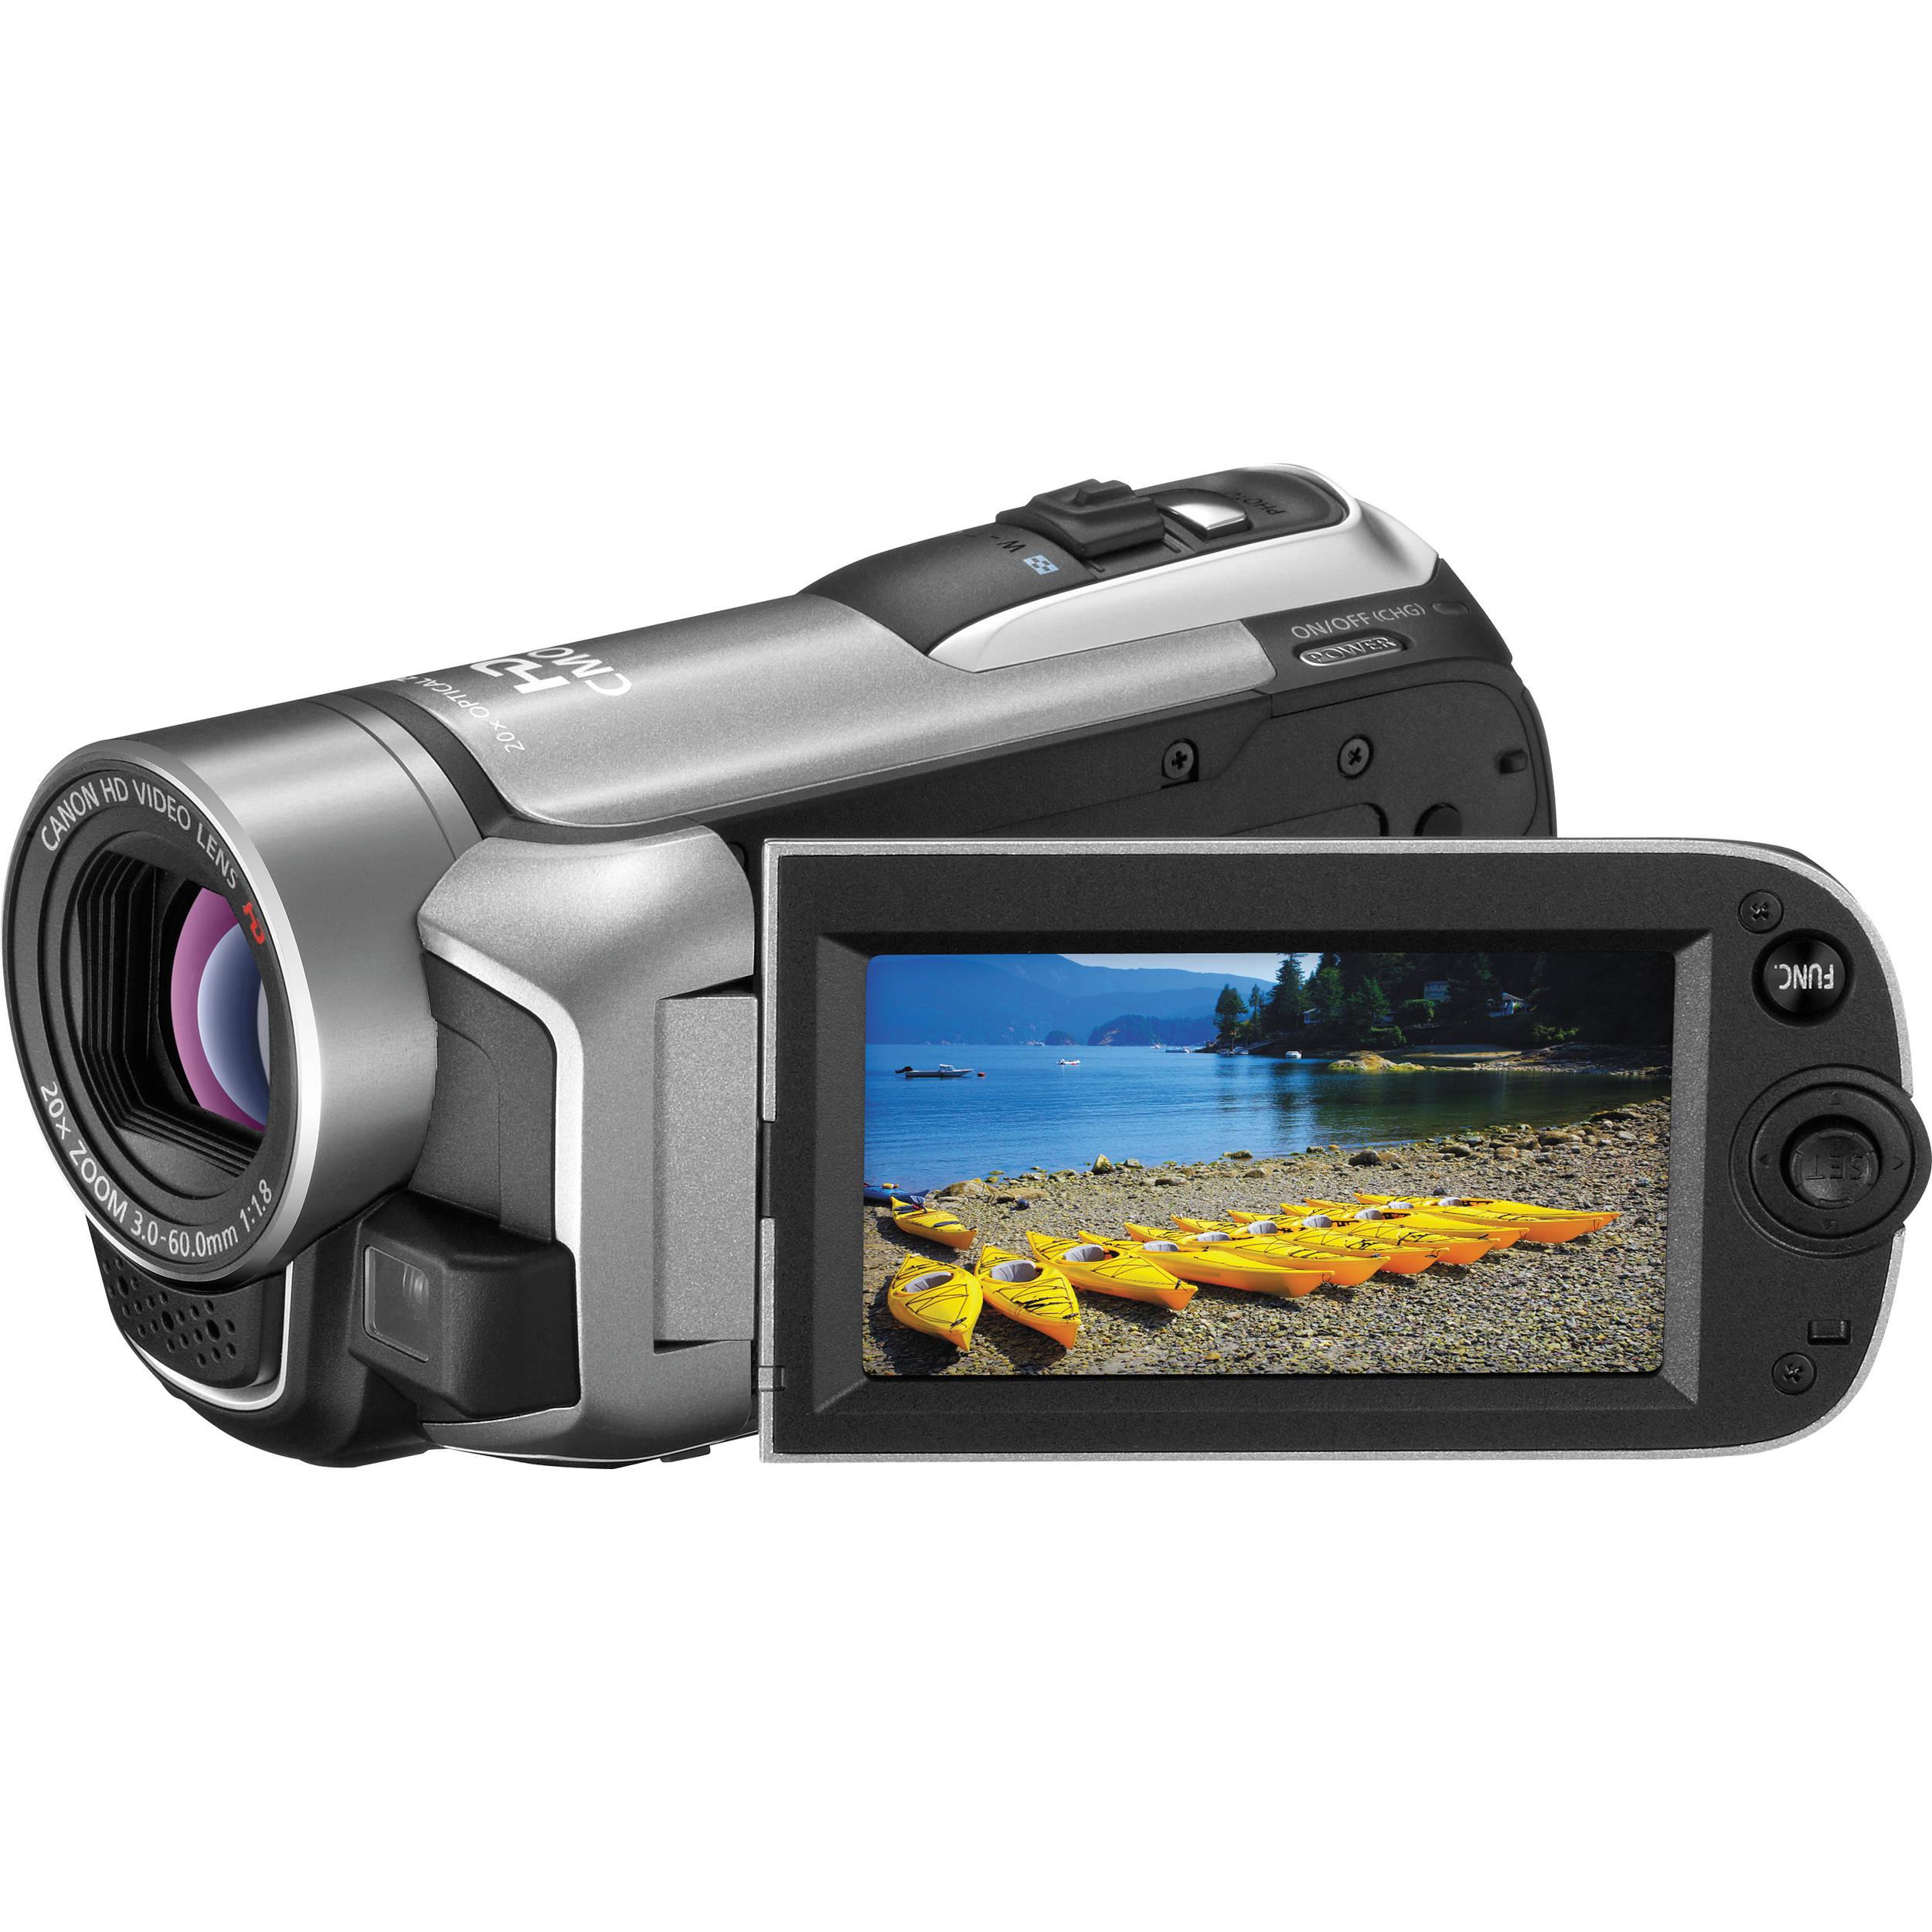 canon vixia hf r10 dual flash memory camcorder silver 4388b001 rh bhphotovideo com  canon vixia hf r10 camcorder manual